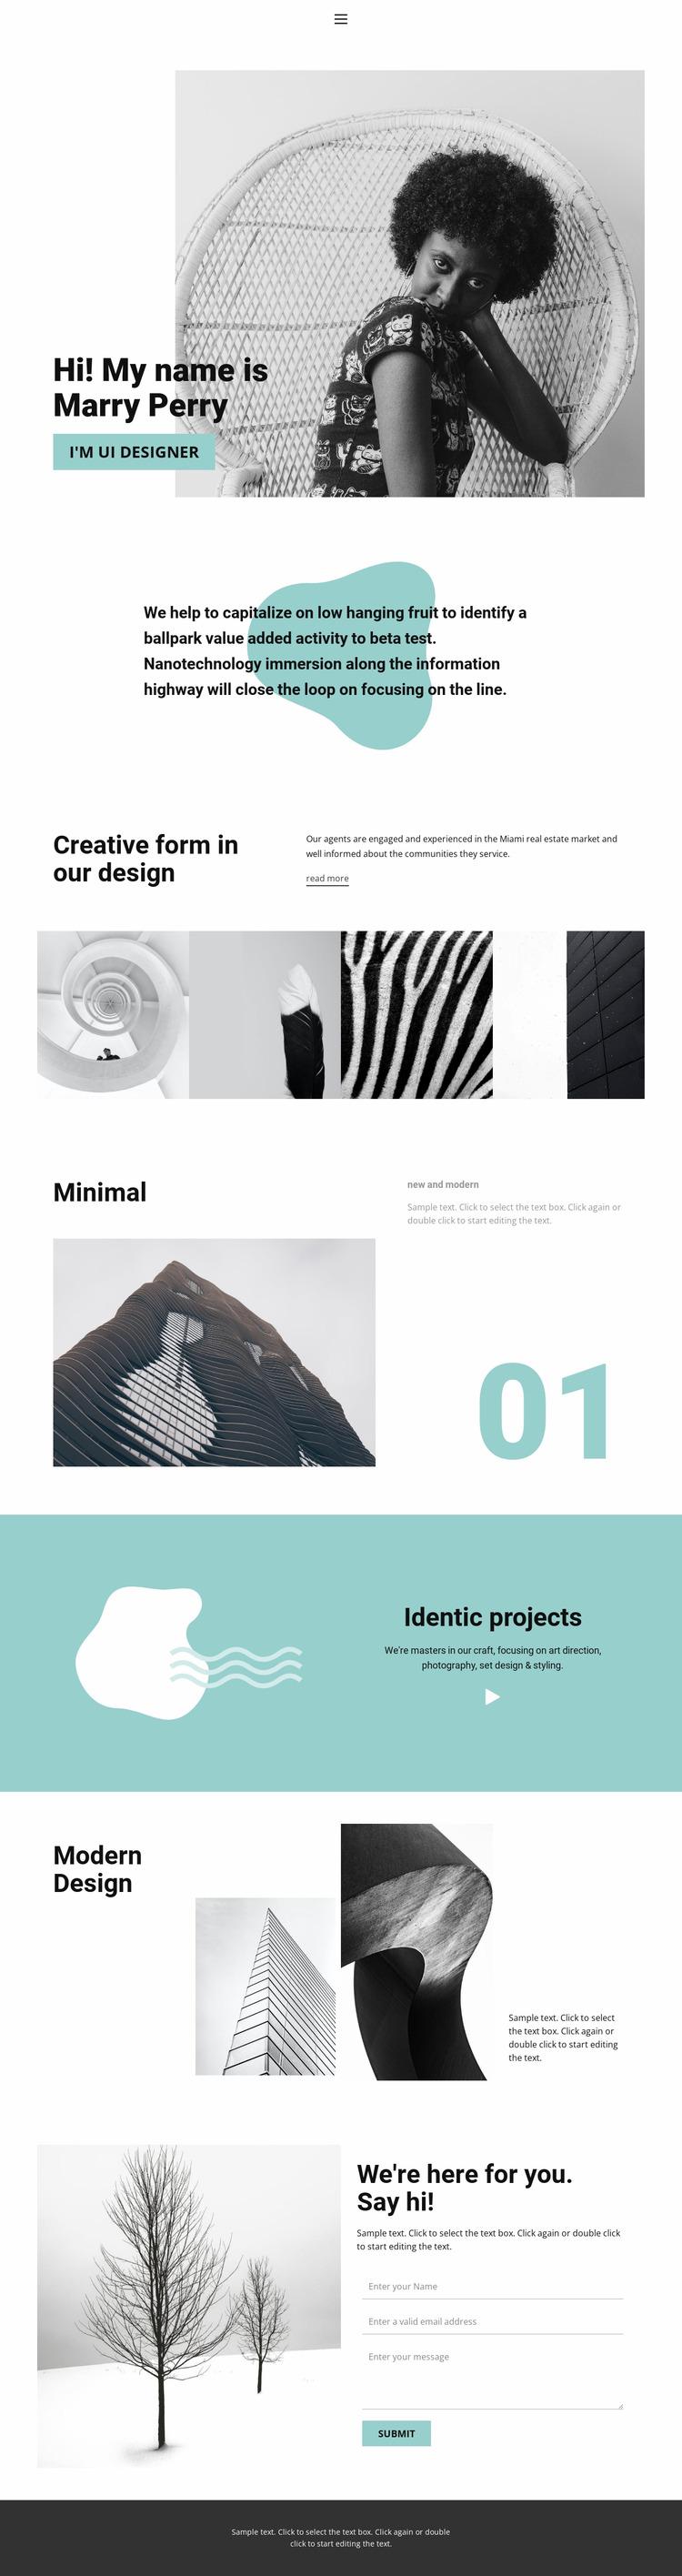 Web design from our studio Html Website Builder